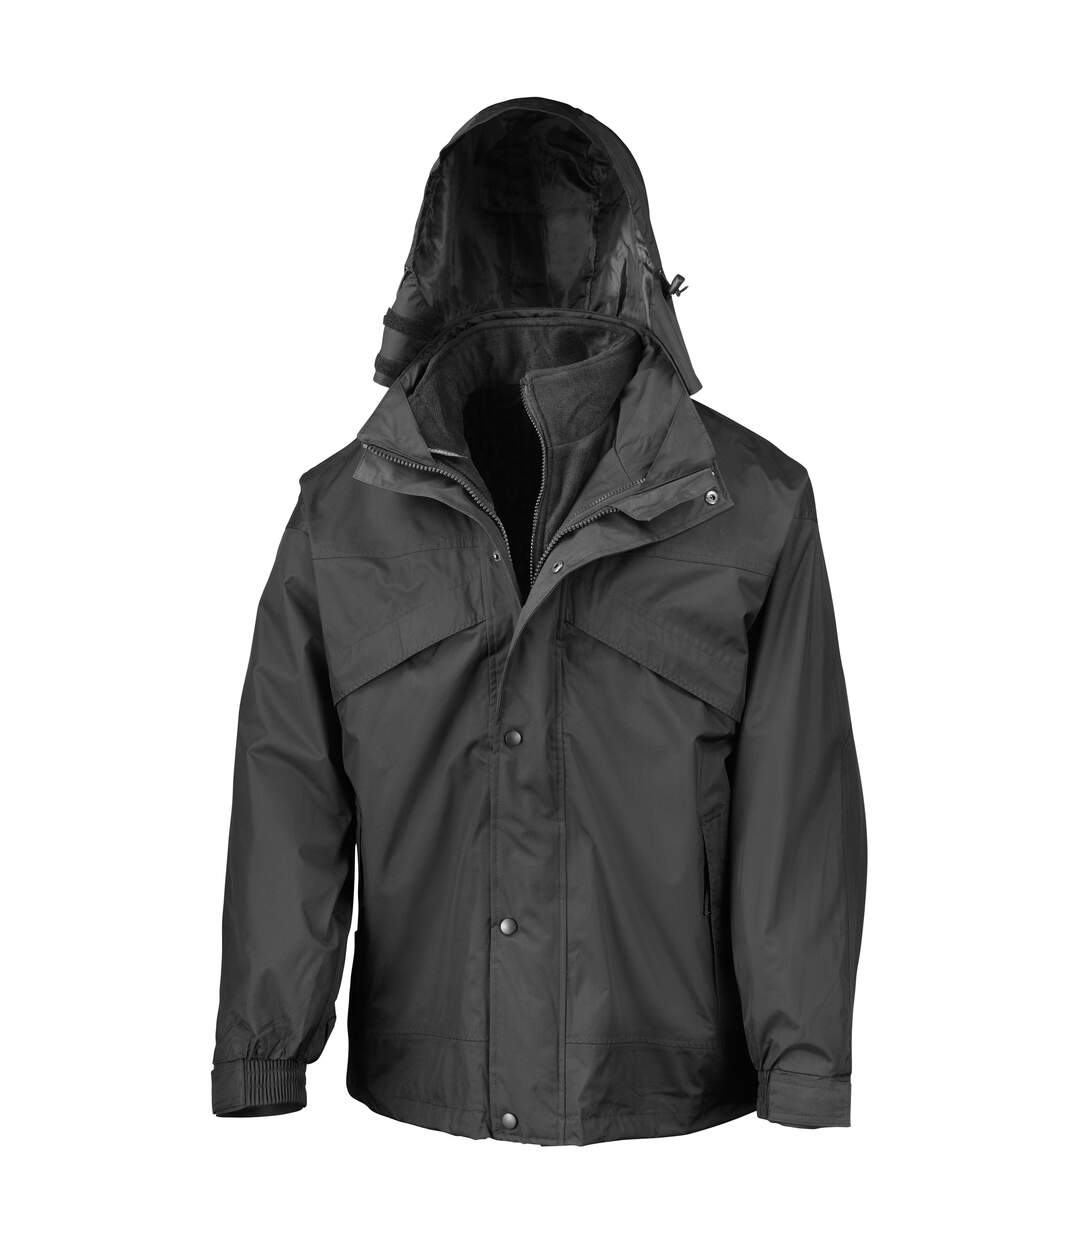 Result Mens 3 In 1 Zip And Clip StormDri Waterproof Windproof Jacket (Black) - UTBC930